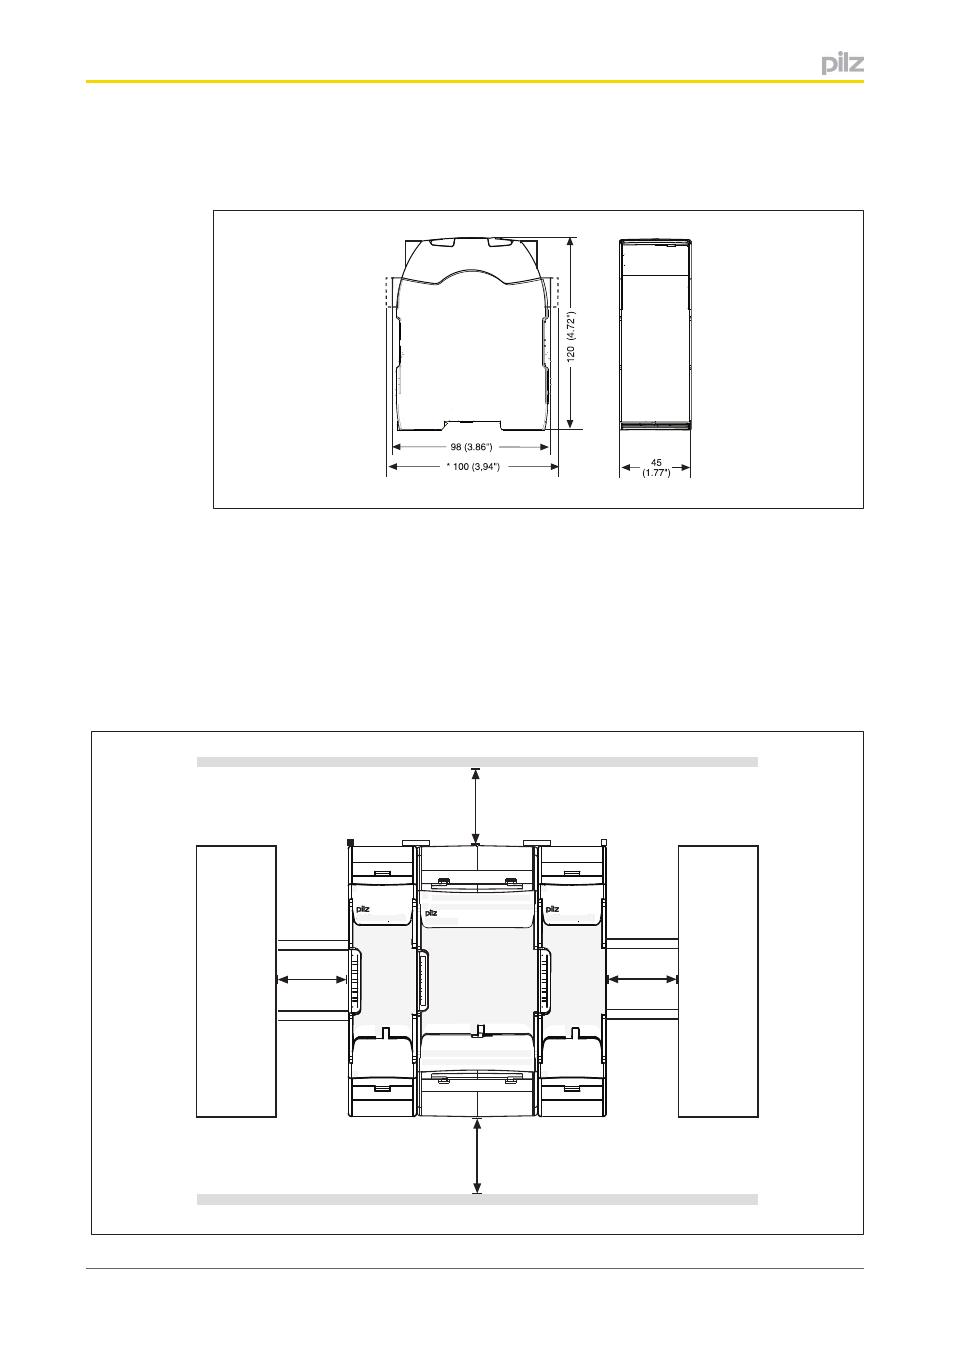 pnoz x4 manual